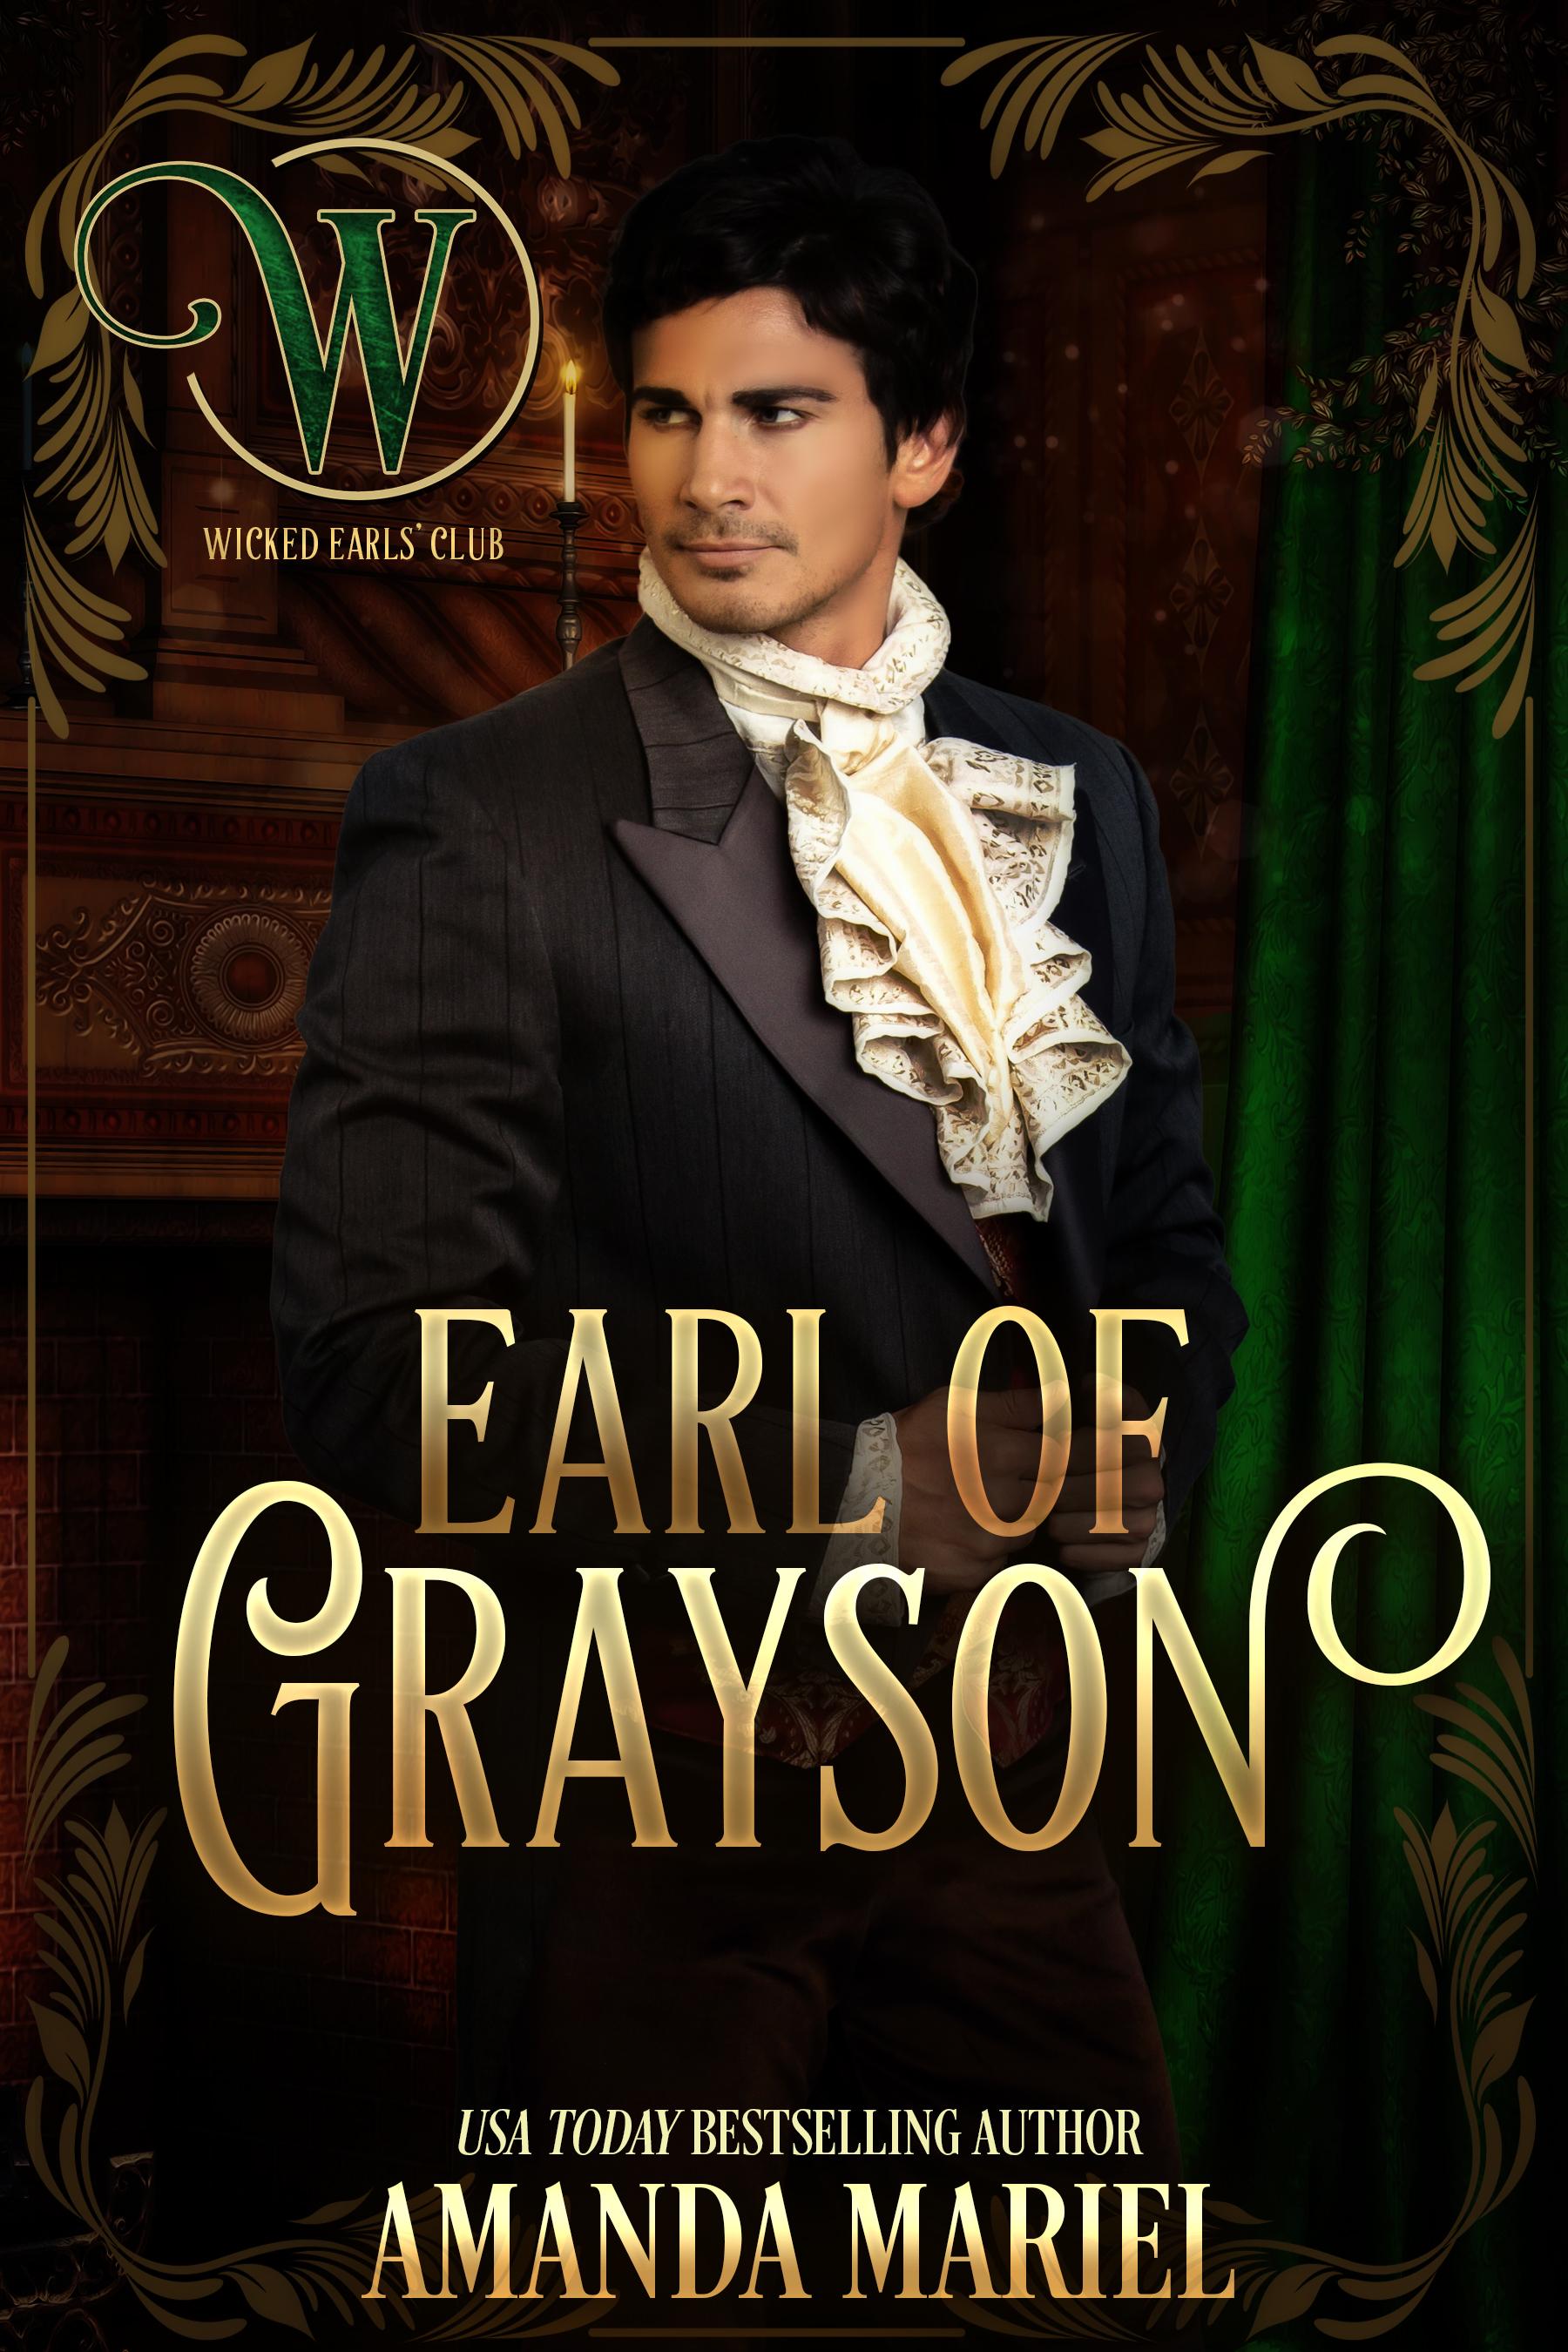 Earl of grayson